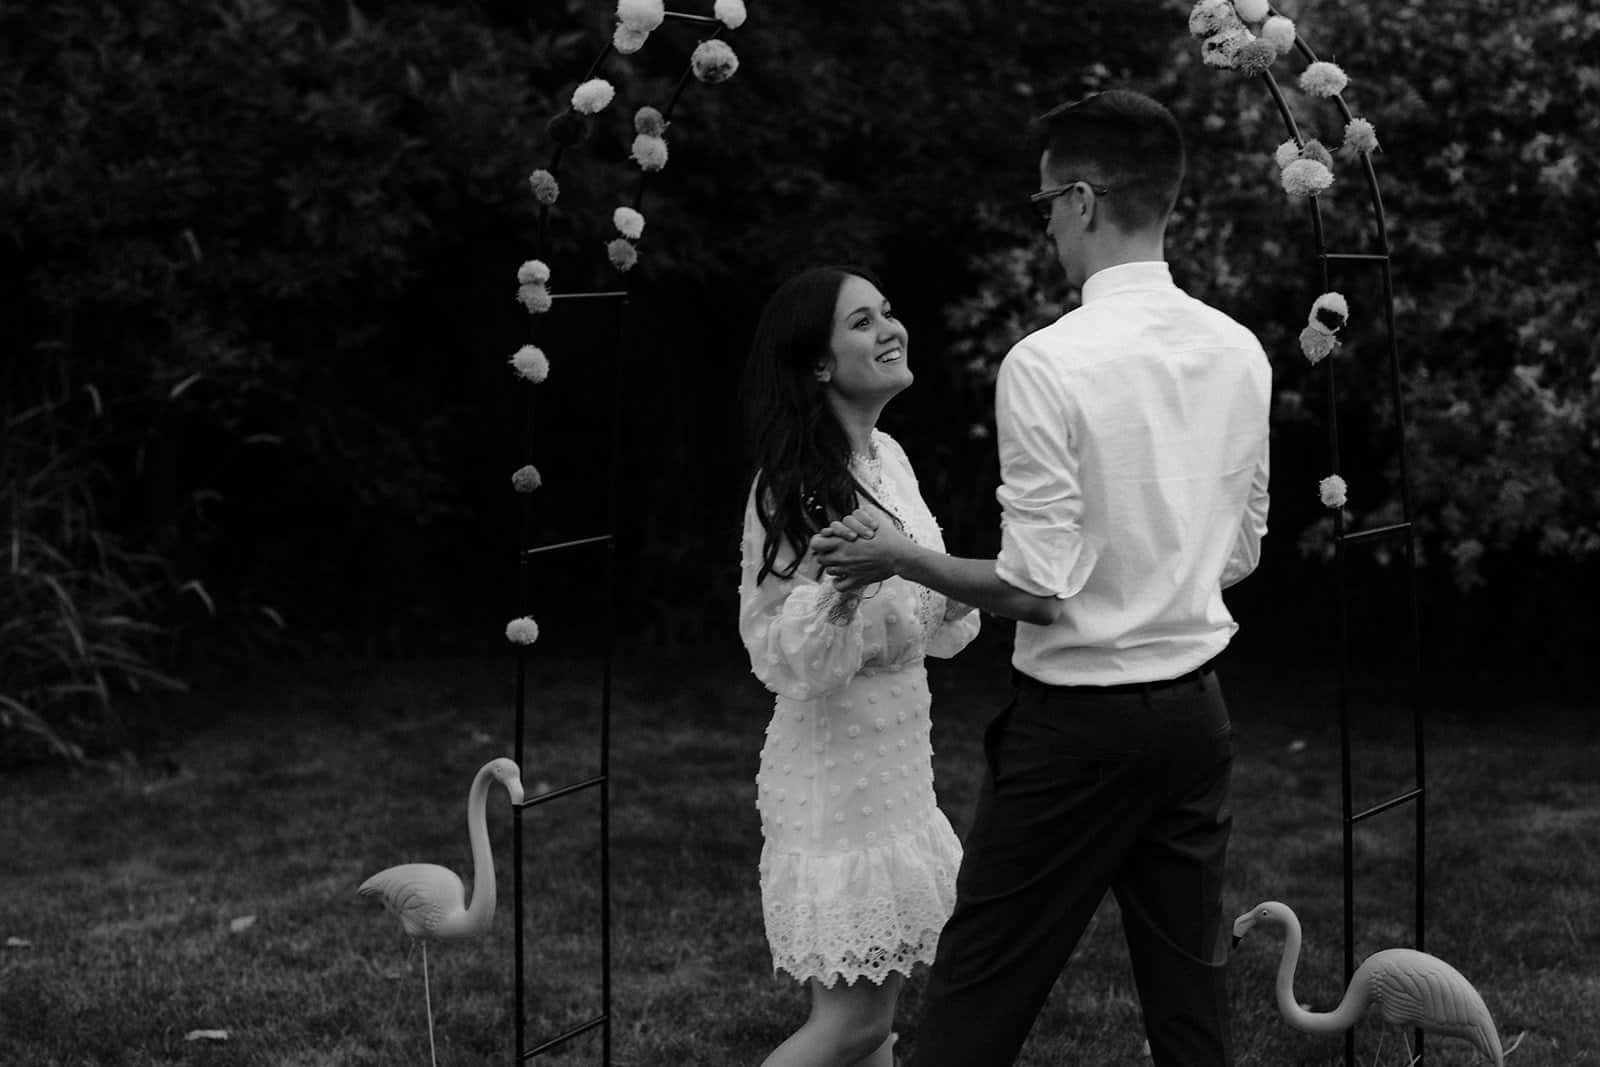 COVID-19 Backyard Wedding - WILLIAM + KAYLA 319